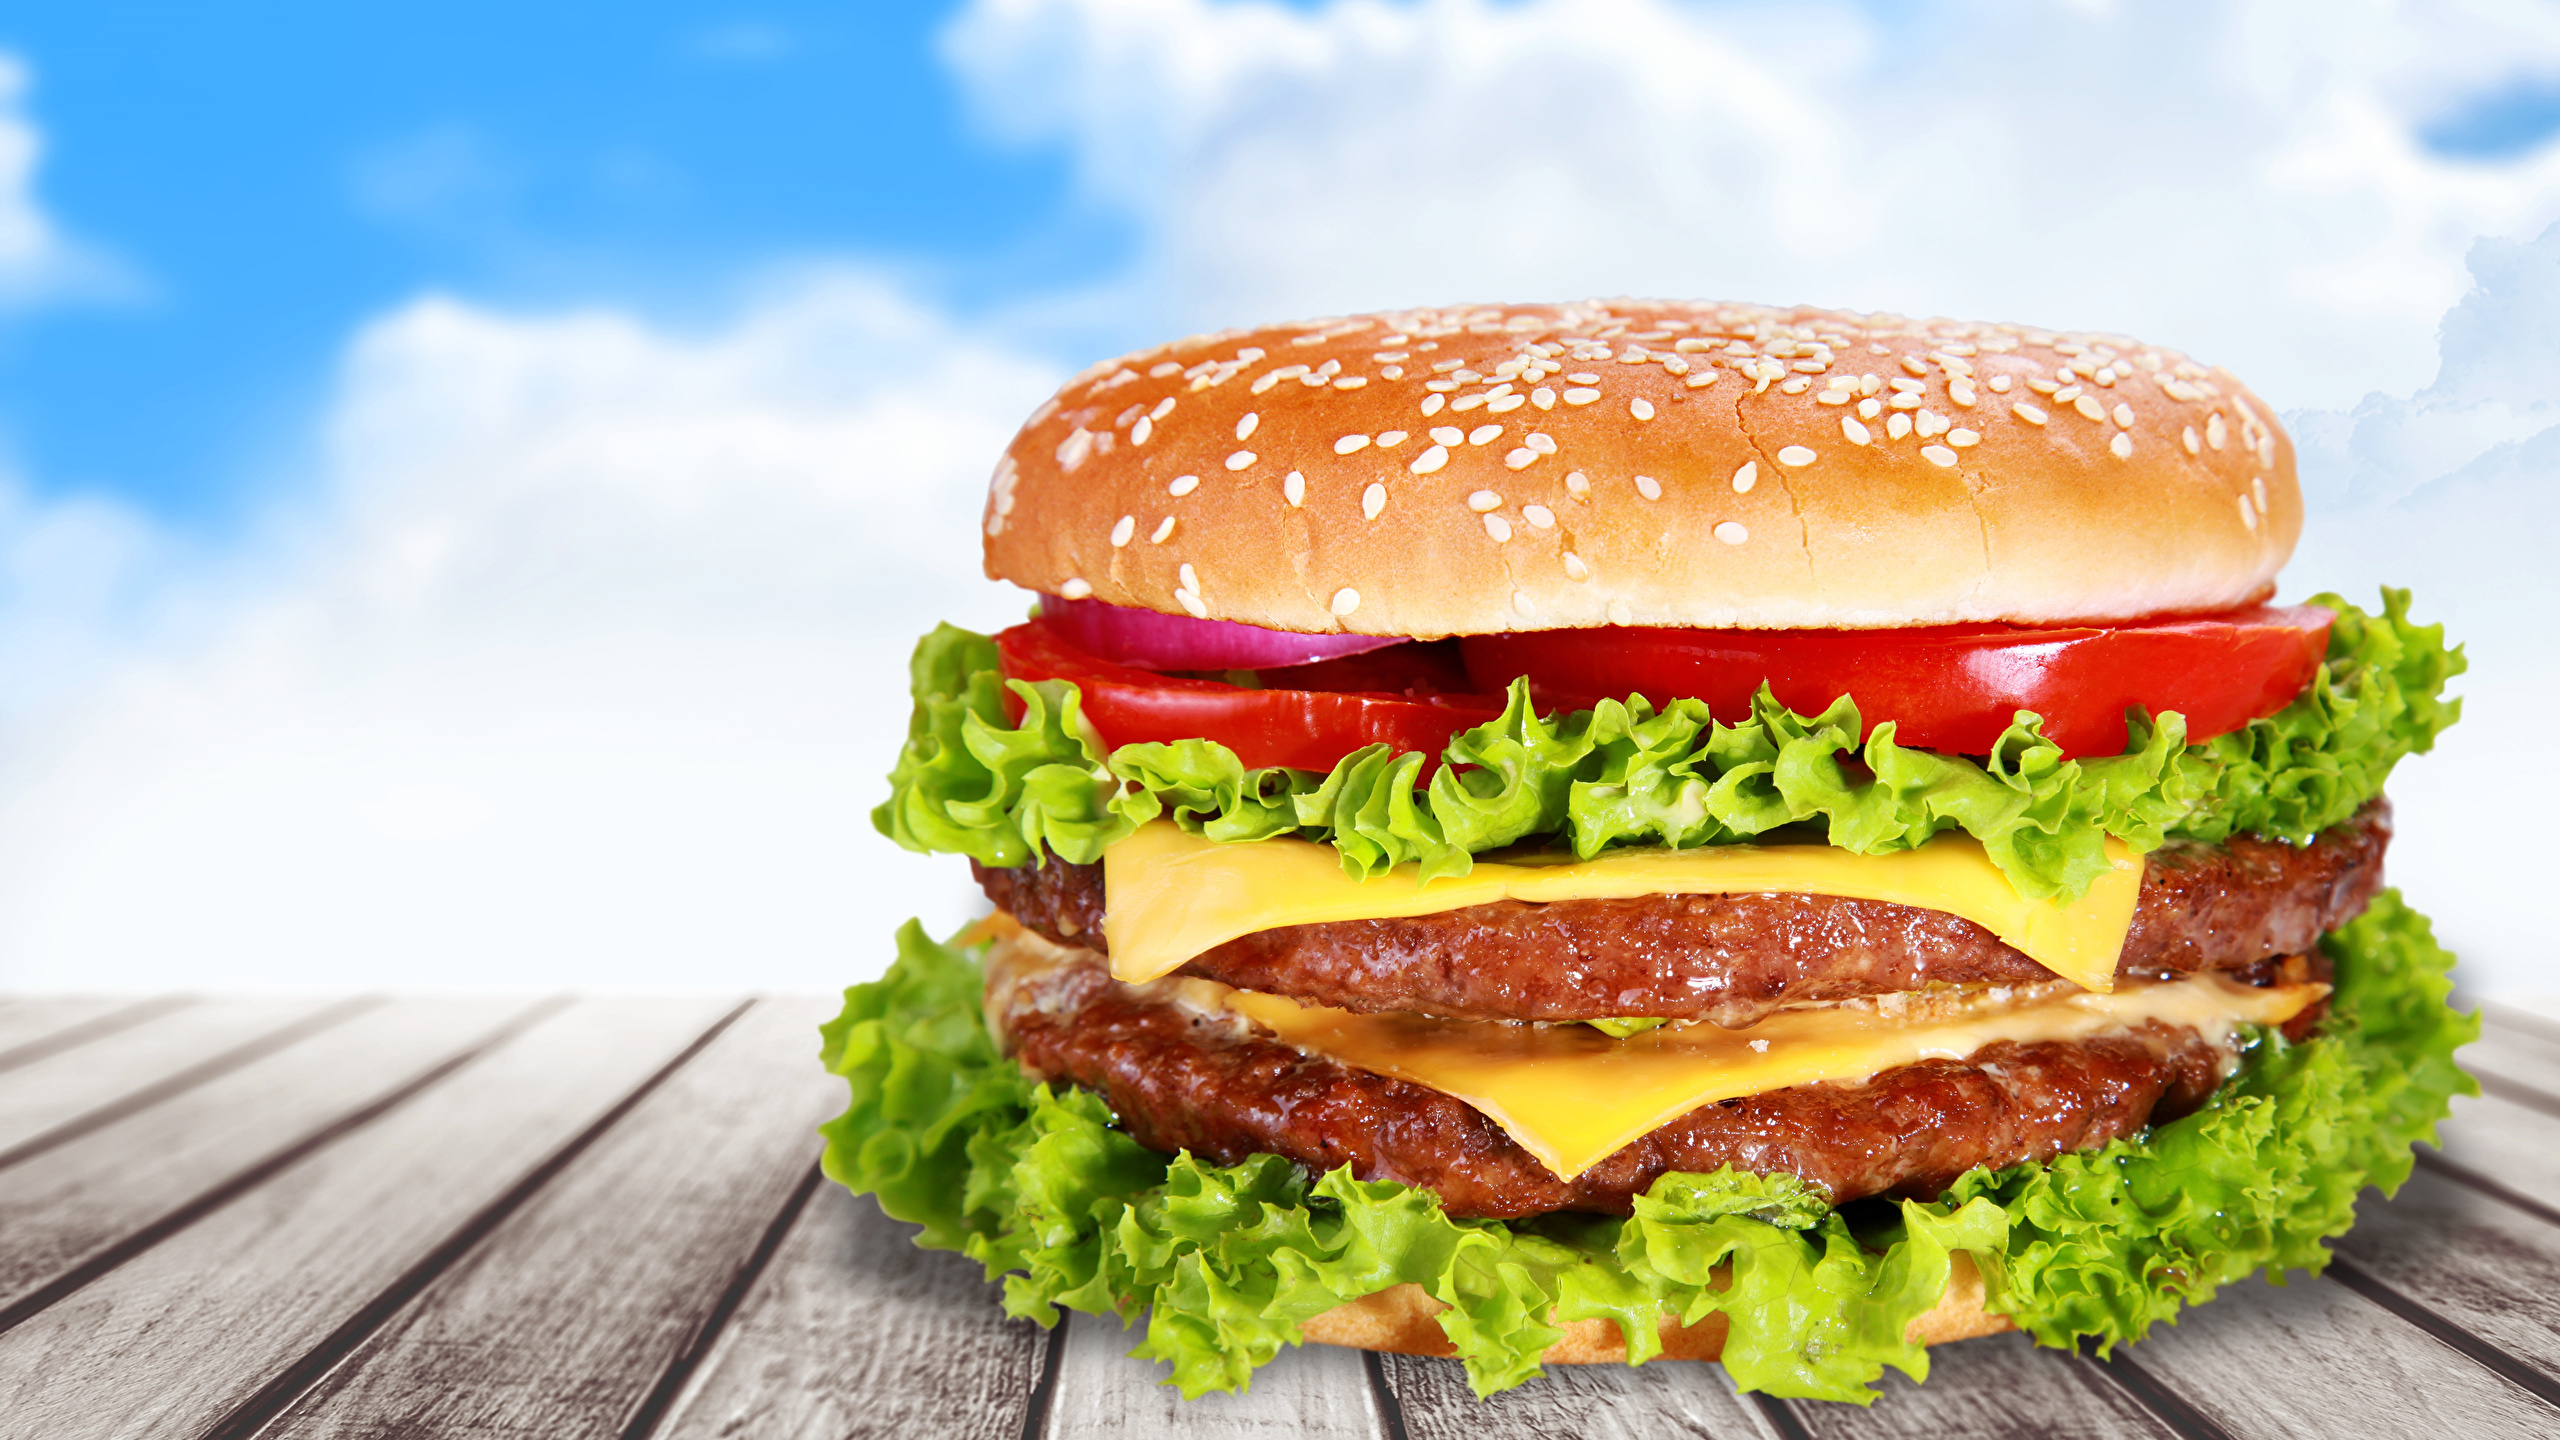 Fotos Hamburger Fast food Gemüse Lebensmittel Bretter 2560x1440 Burger